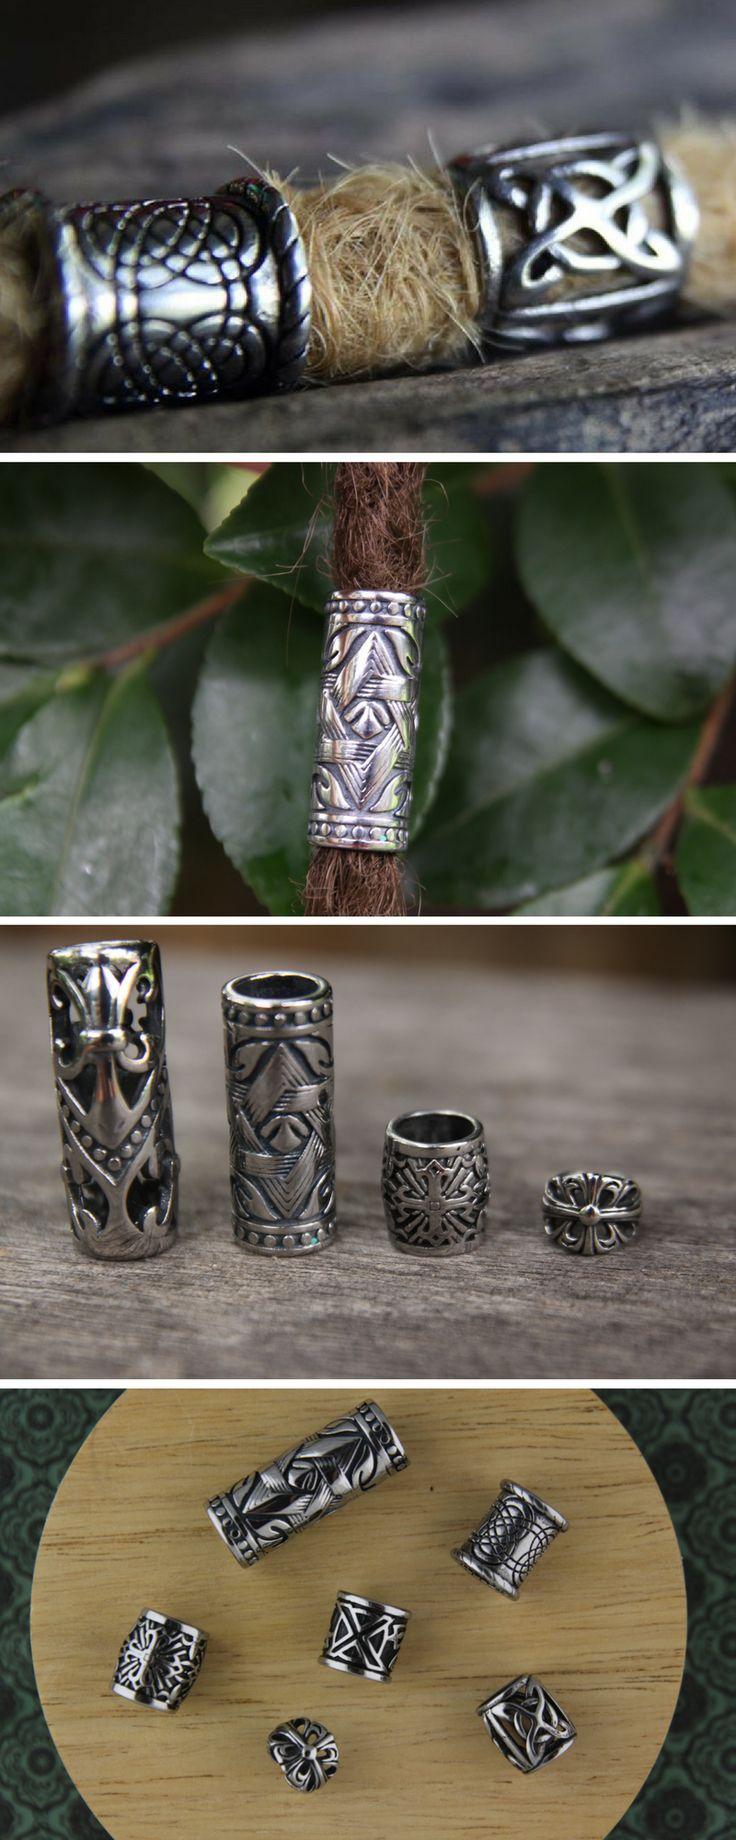 Stainless Steel Dreadlock Beads that don't tarnish or fade. Quality Dreadlock Beads. Dread beads for men. Viking Hair Beads. Beard Beads. Mountain Dreads. #dreadbeads #dreadbeadsformen #vikingbeads #beardbeads